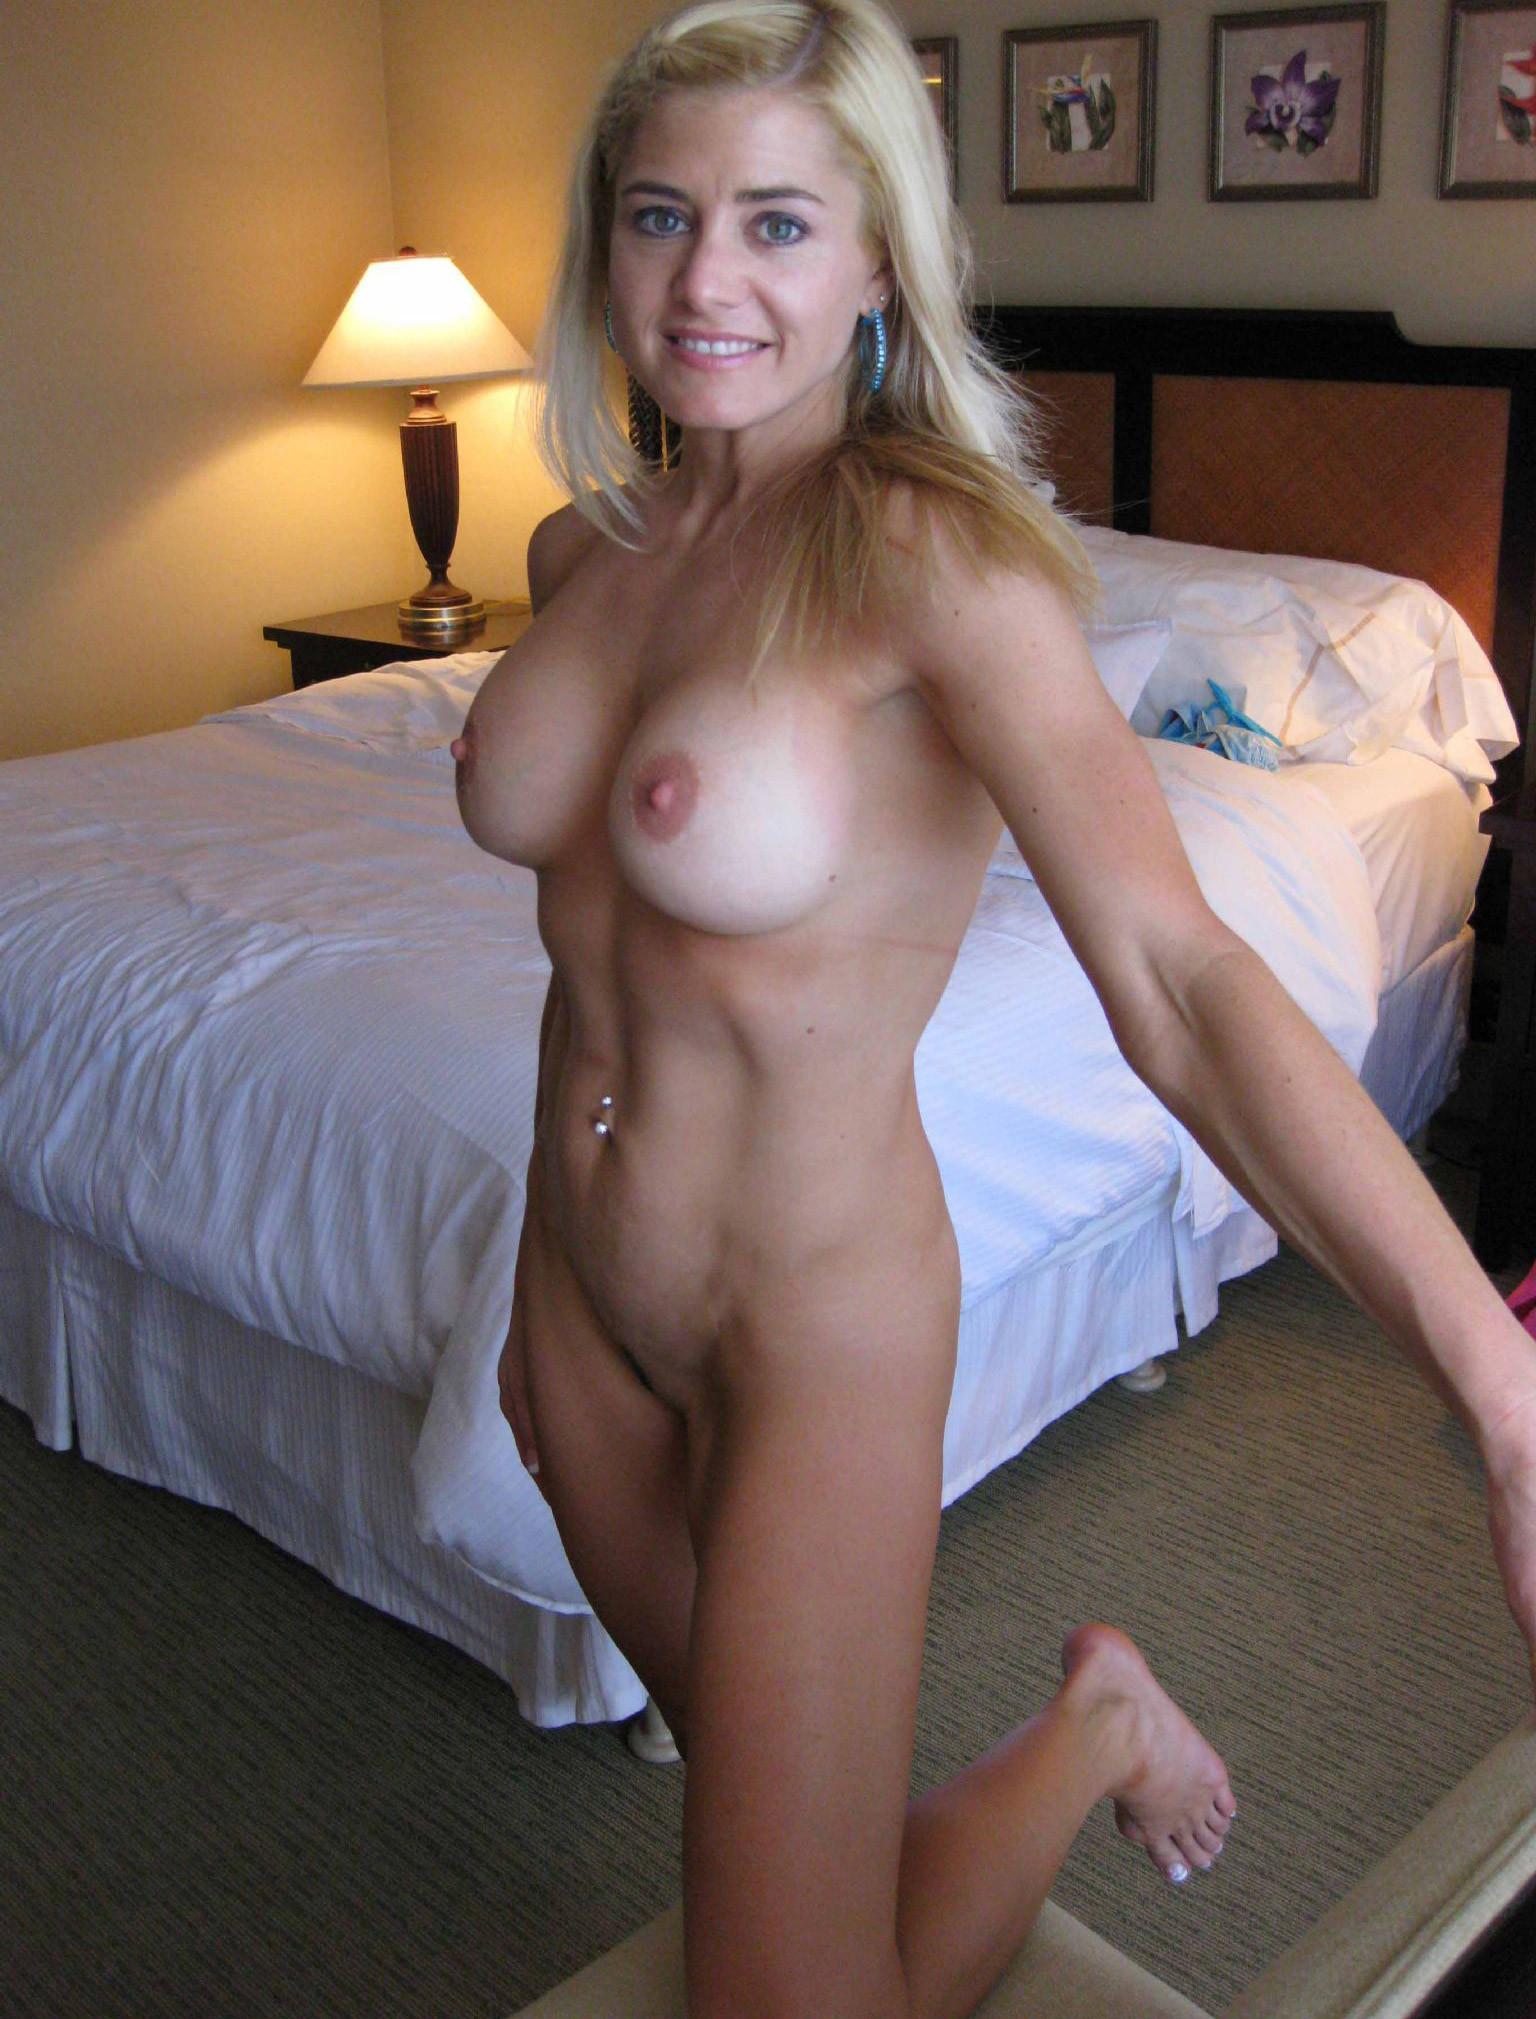 В подборке дамы в соку позируют на курорте секс фото и порно фото